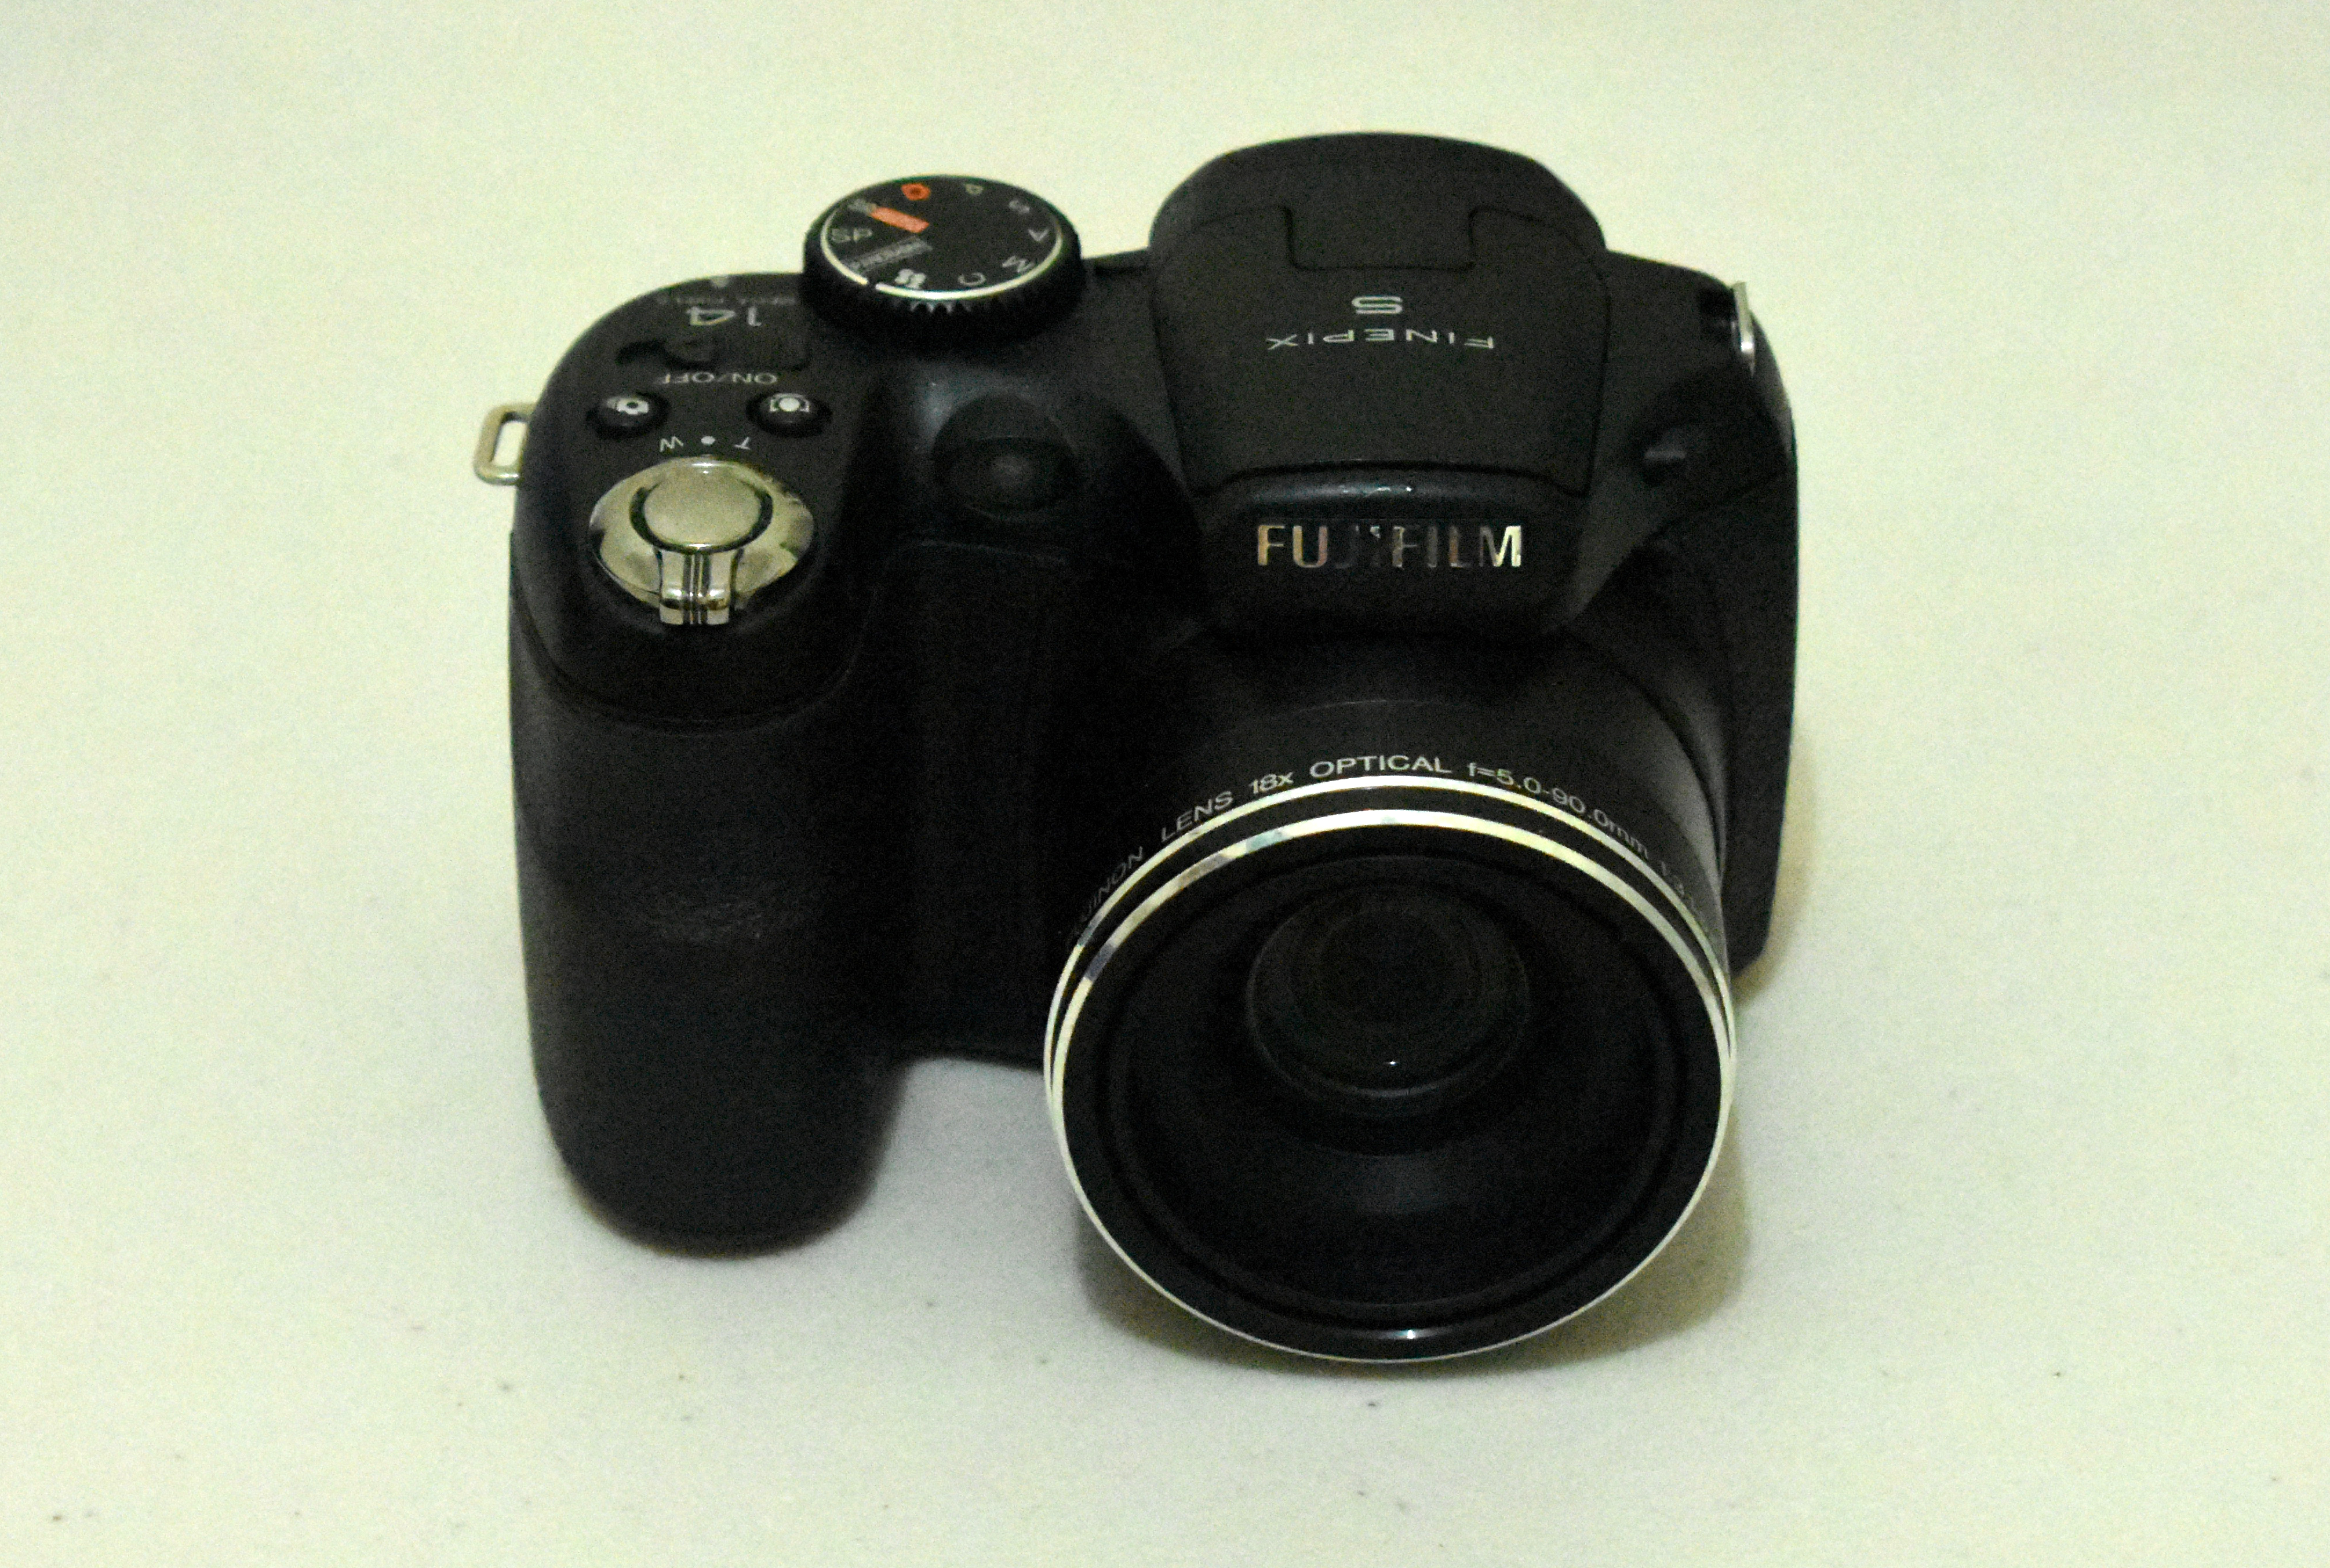 File:Fujifilm FinePix S2950.jpg